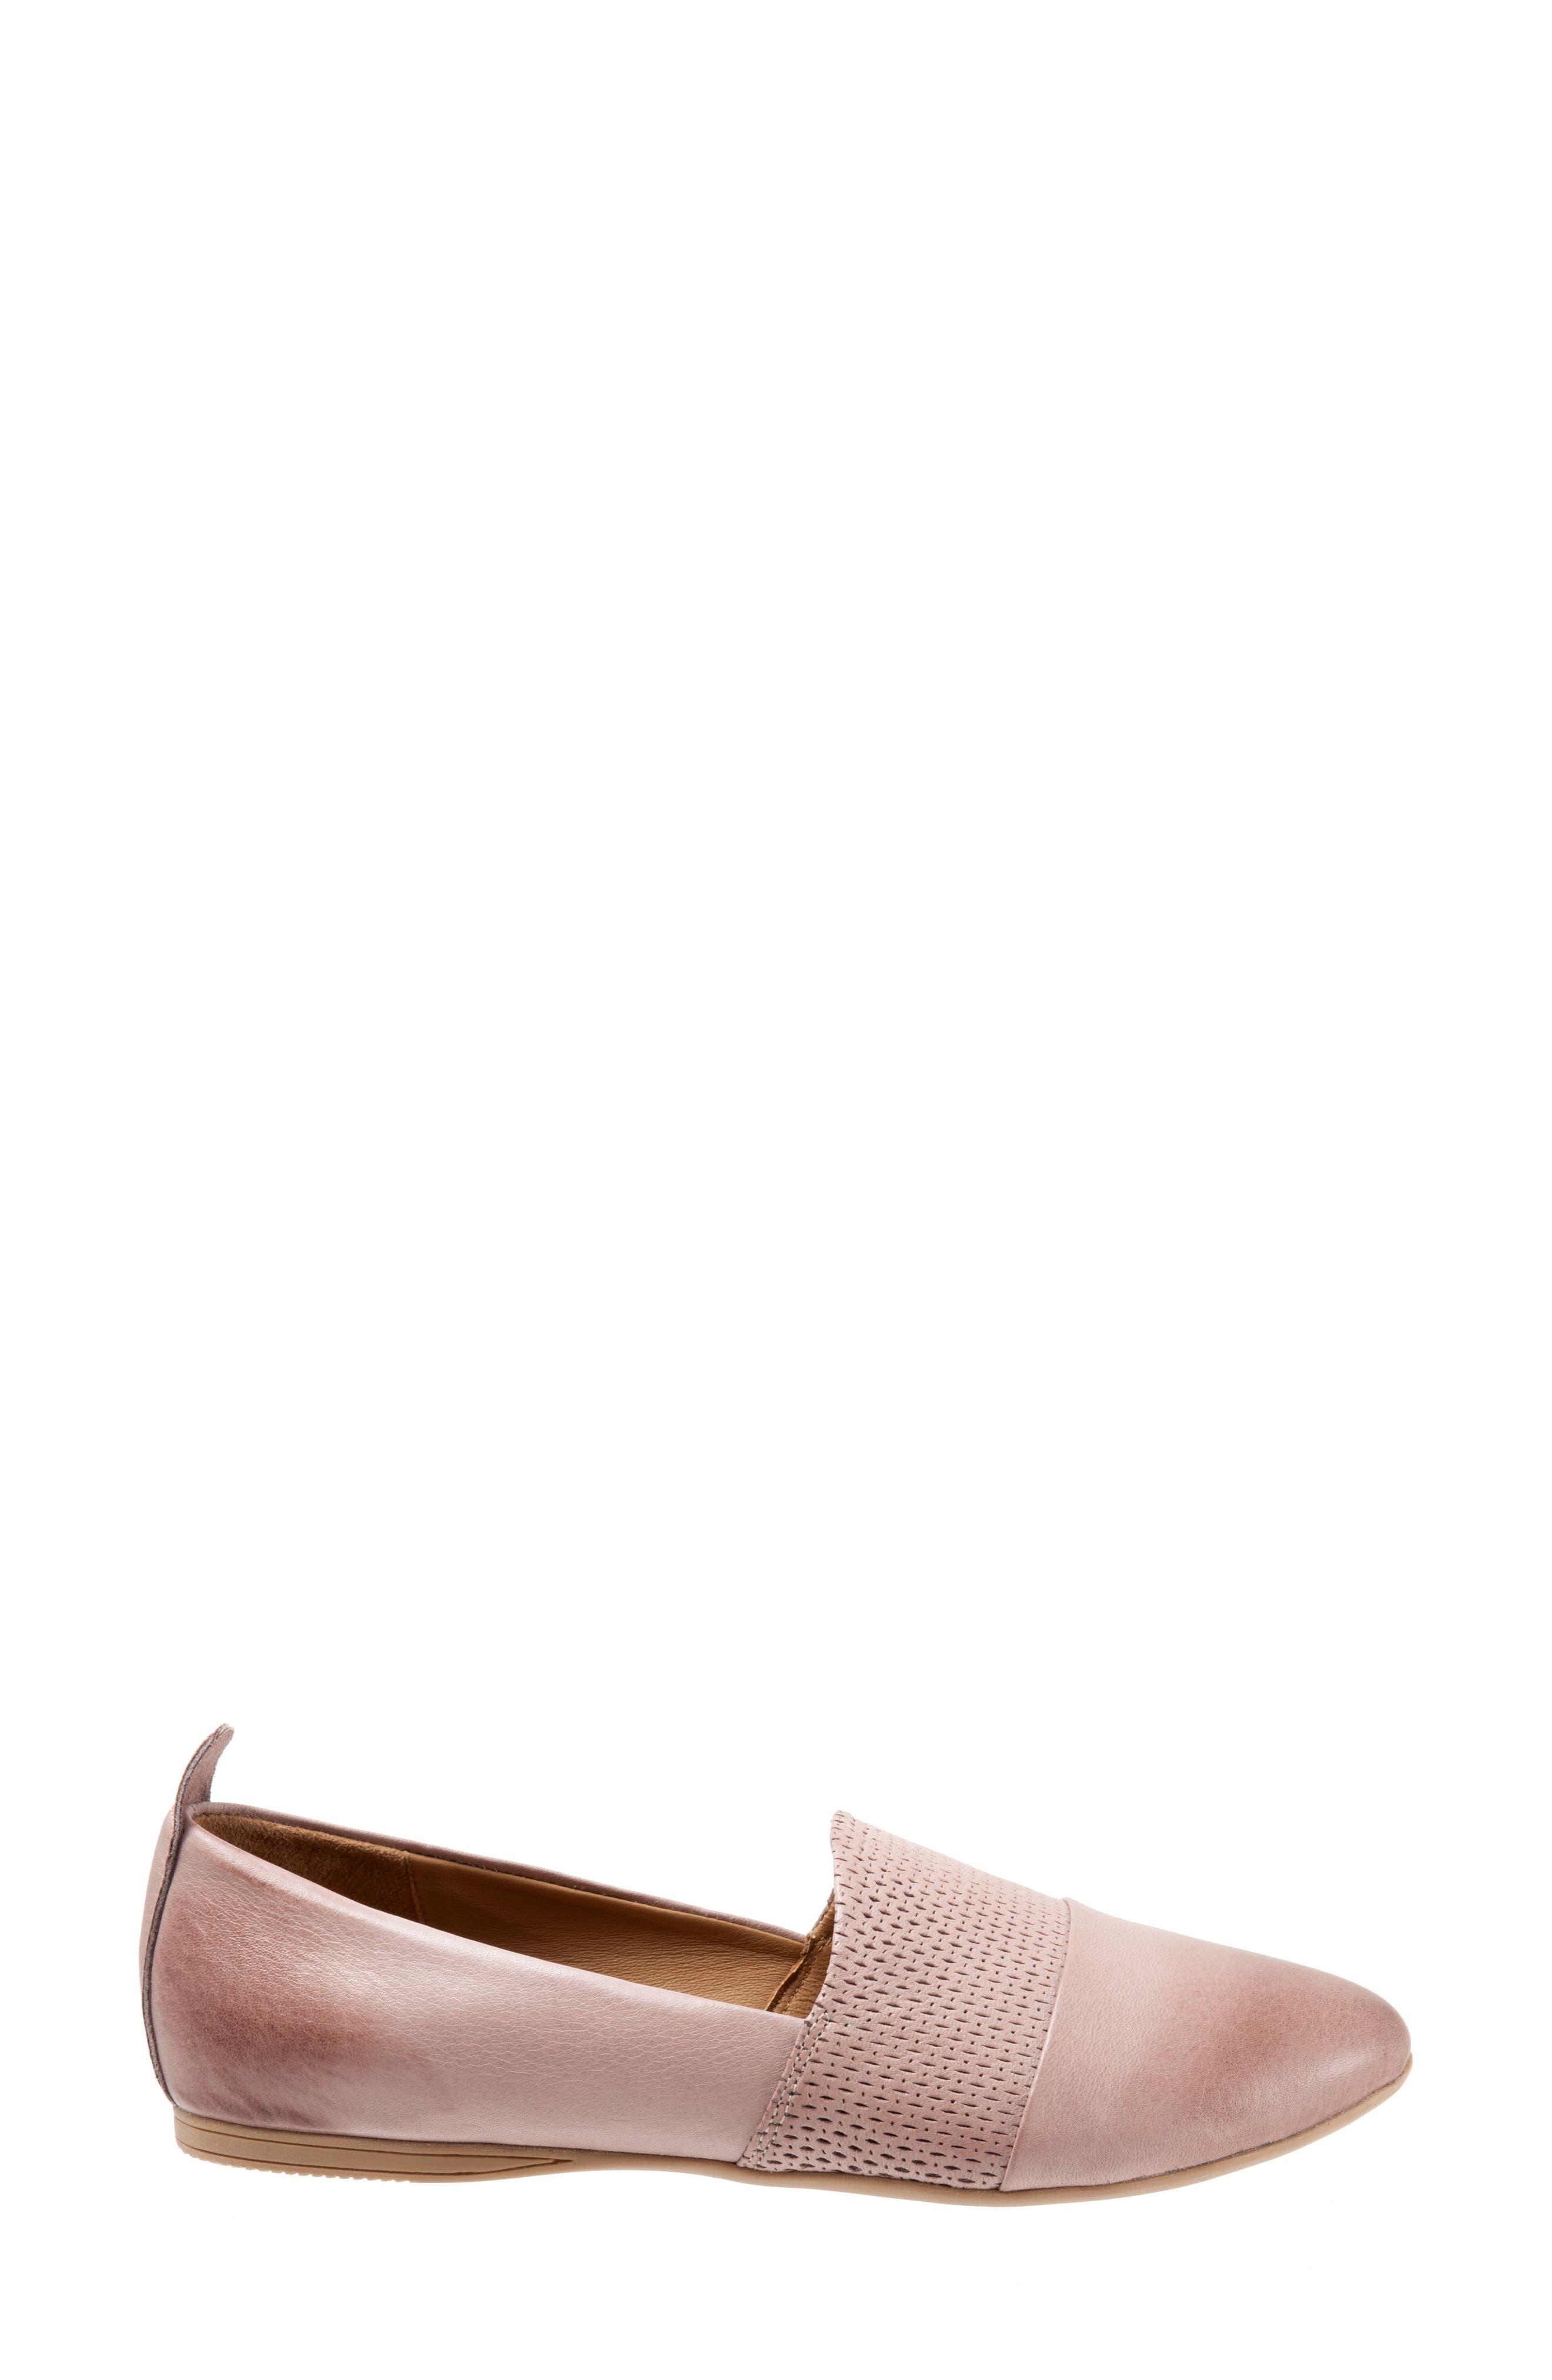 Katy Flat,                             Alternate thumbnail 3, color,                             Dusty Mauve Leather